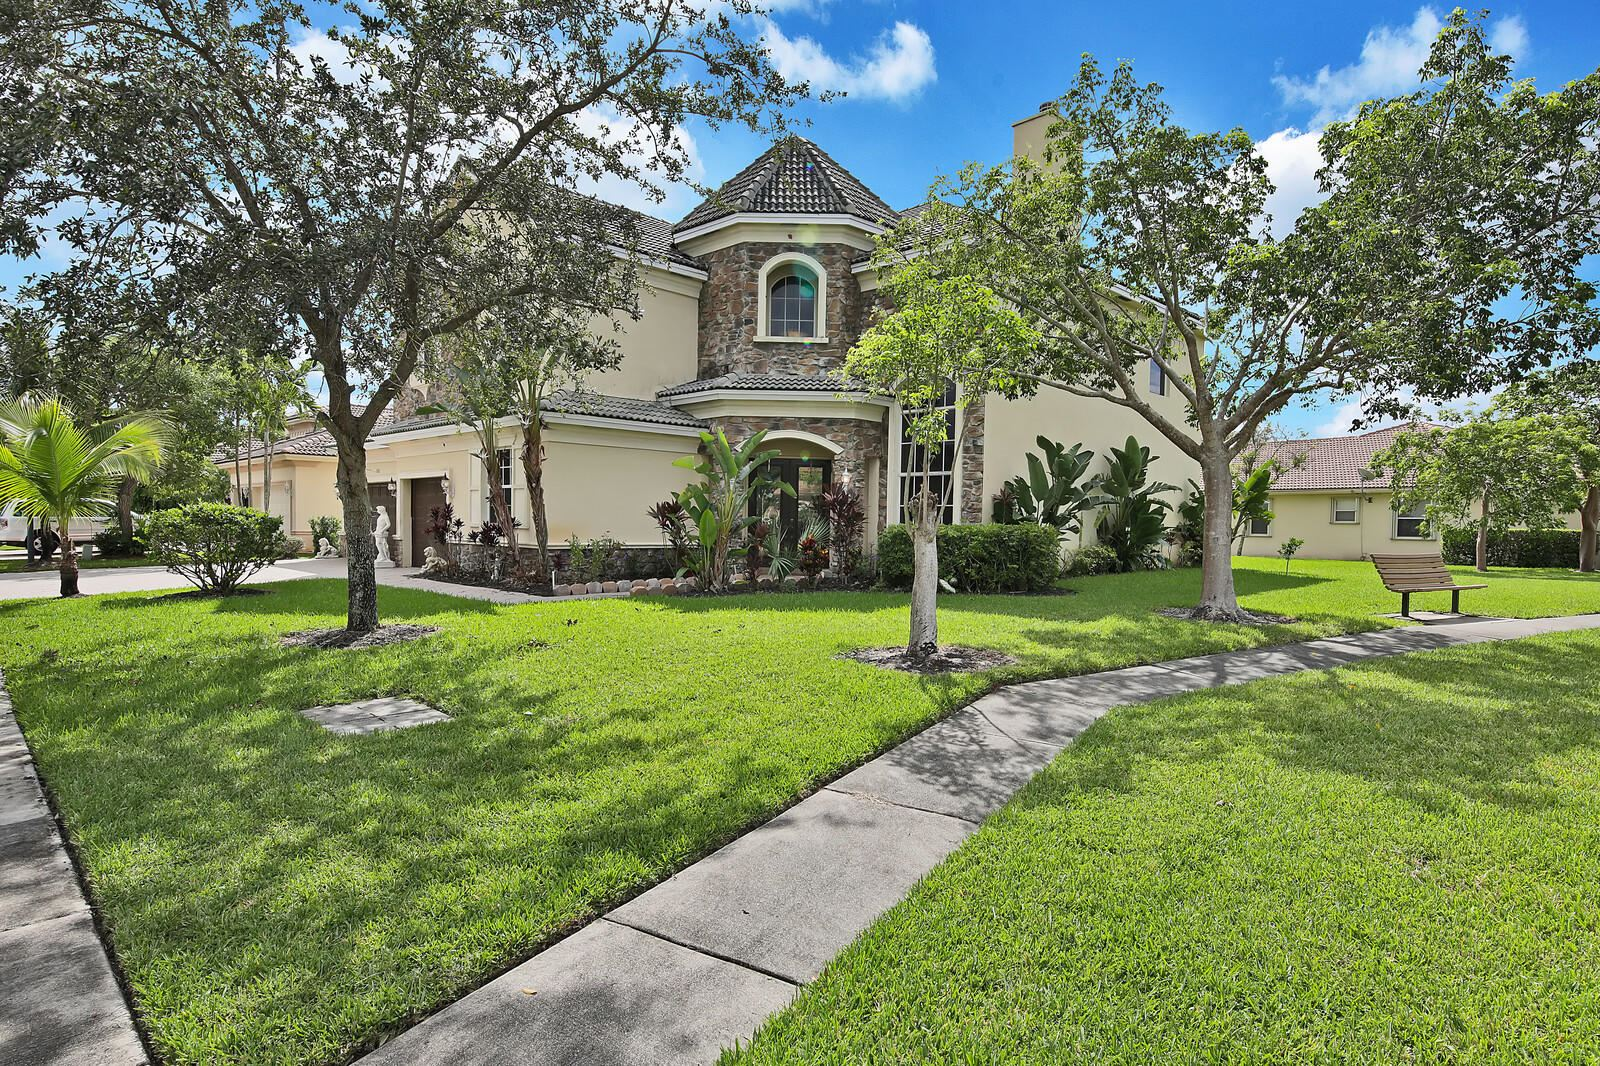 9292 Pineville Drive, Lake Worth, FL 33467 - #: RX-10657653